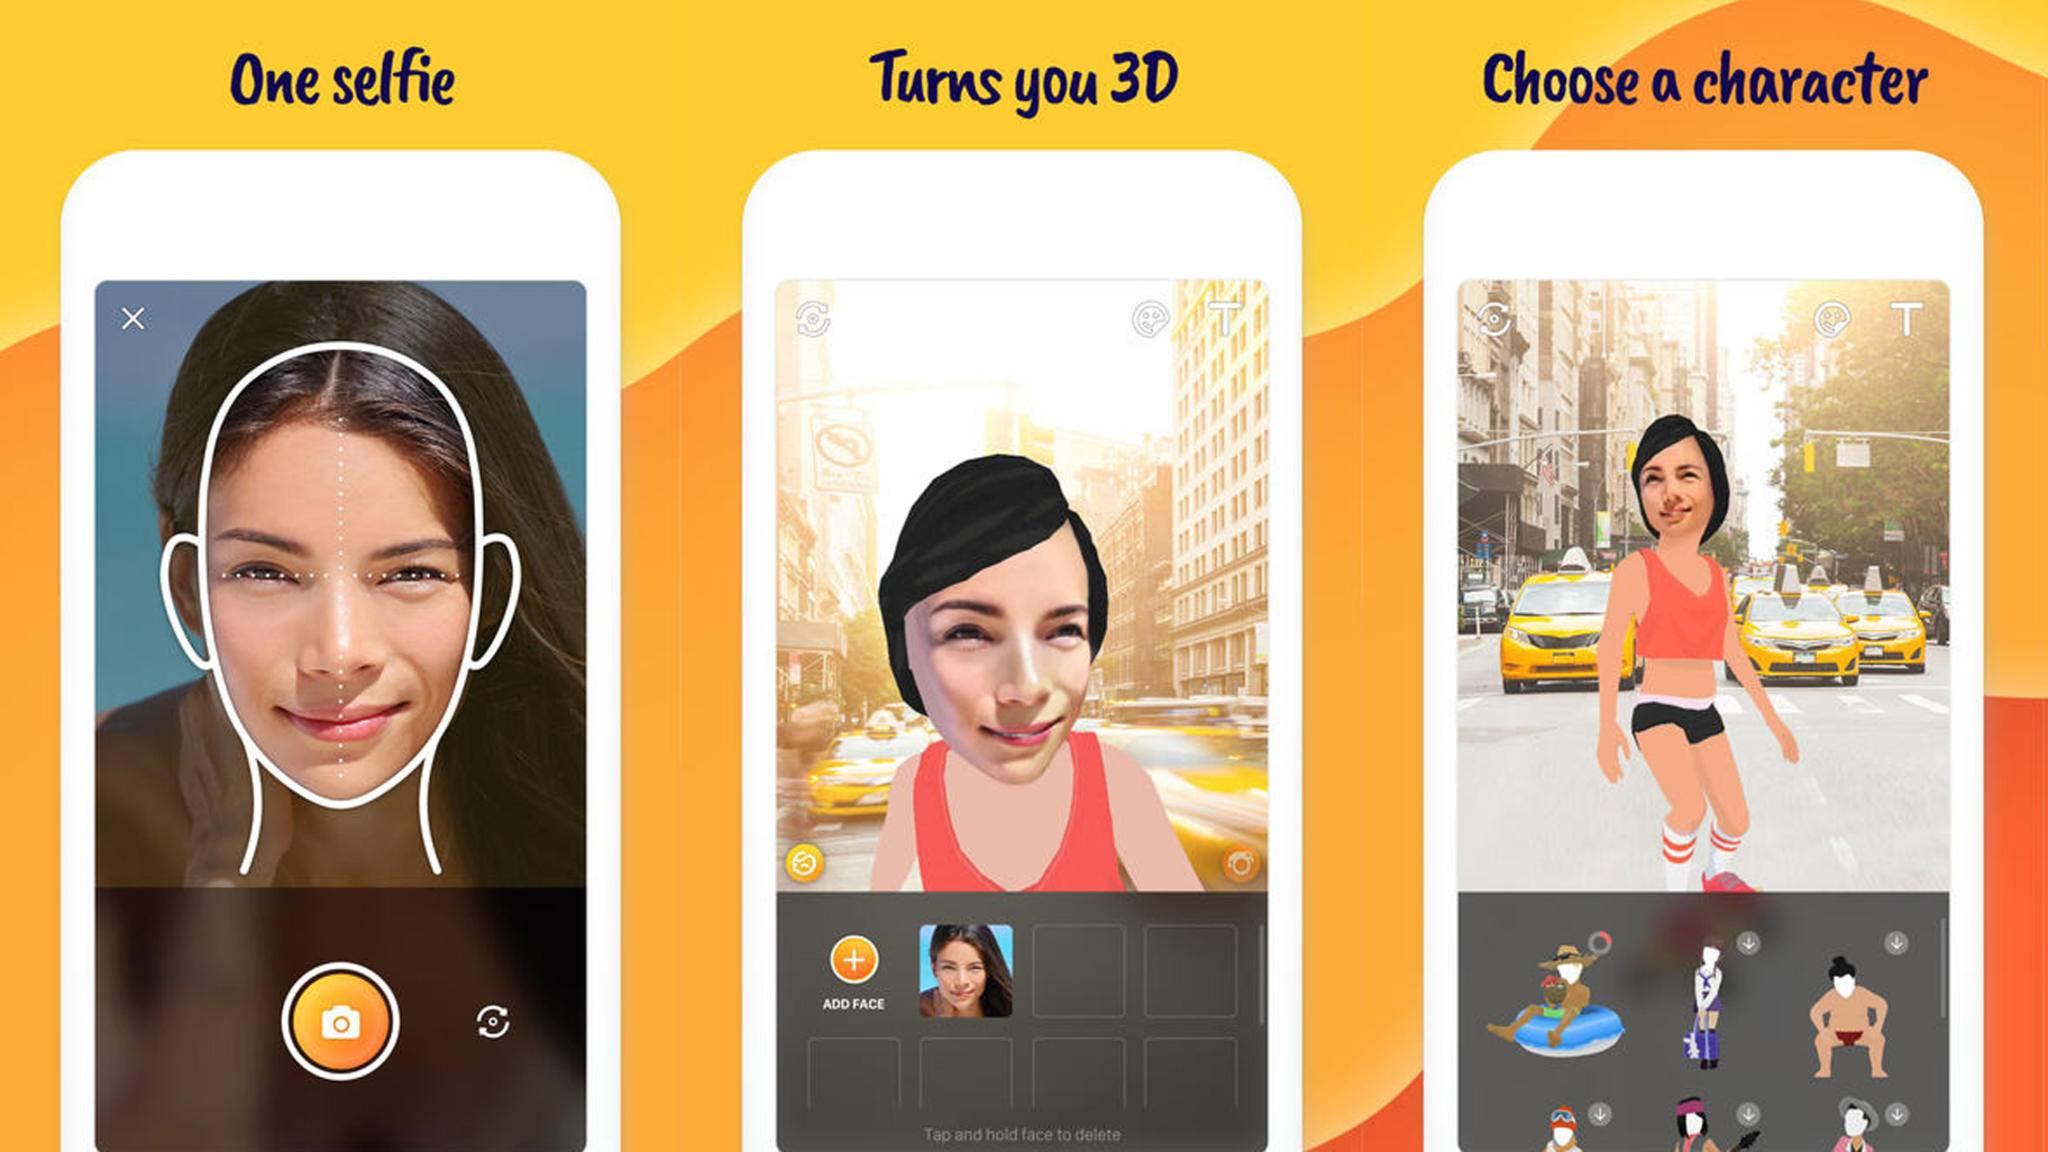 Die 3D-Selfie-App Miso Happy macht aus Dir einen Cartooncharakter.